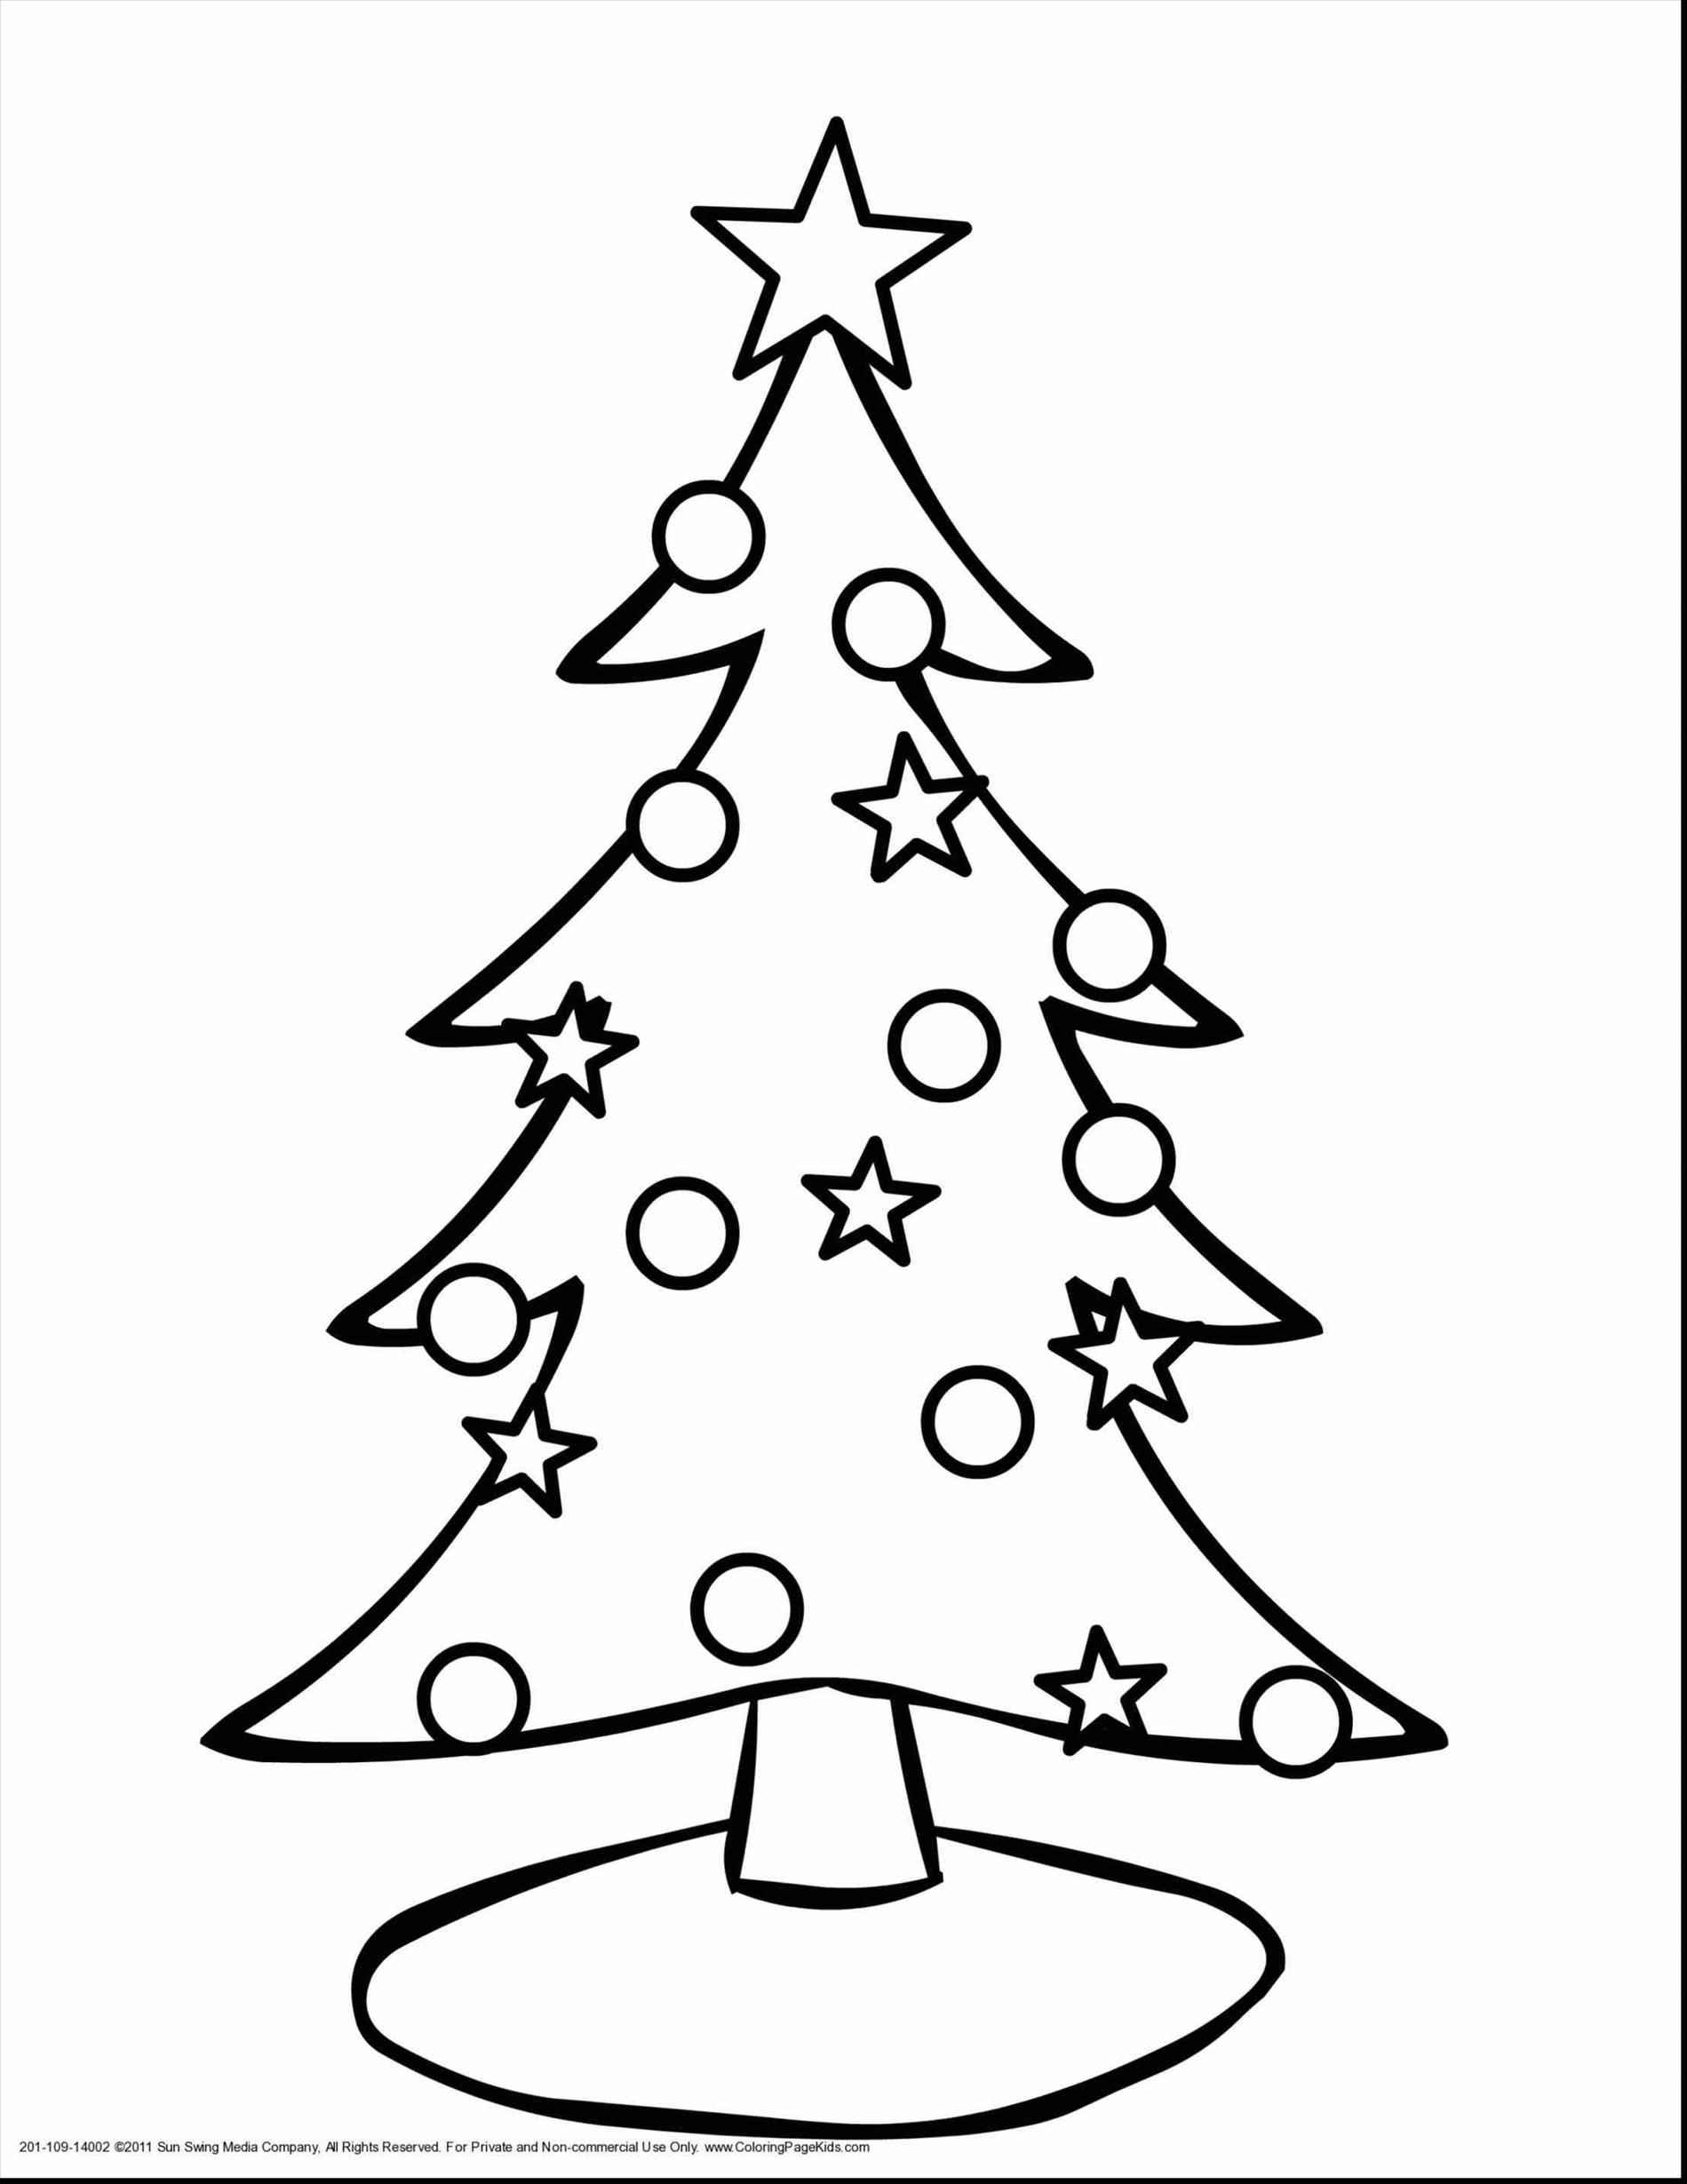 1899x2459 Christmas Card Drawing Ideas Tumblr Merry Christmas Amp Happy New